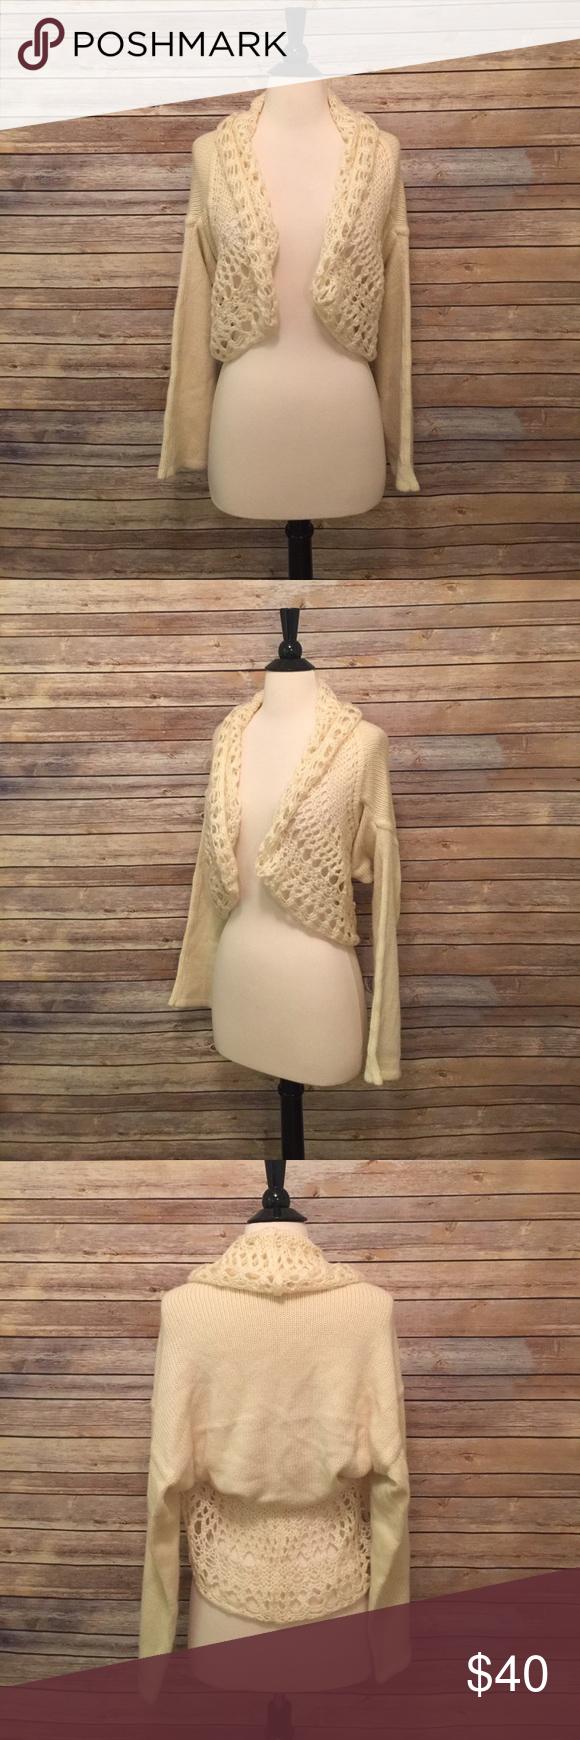 Anthropologie Sleeping on Snow Shrug Sweater